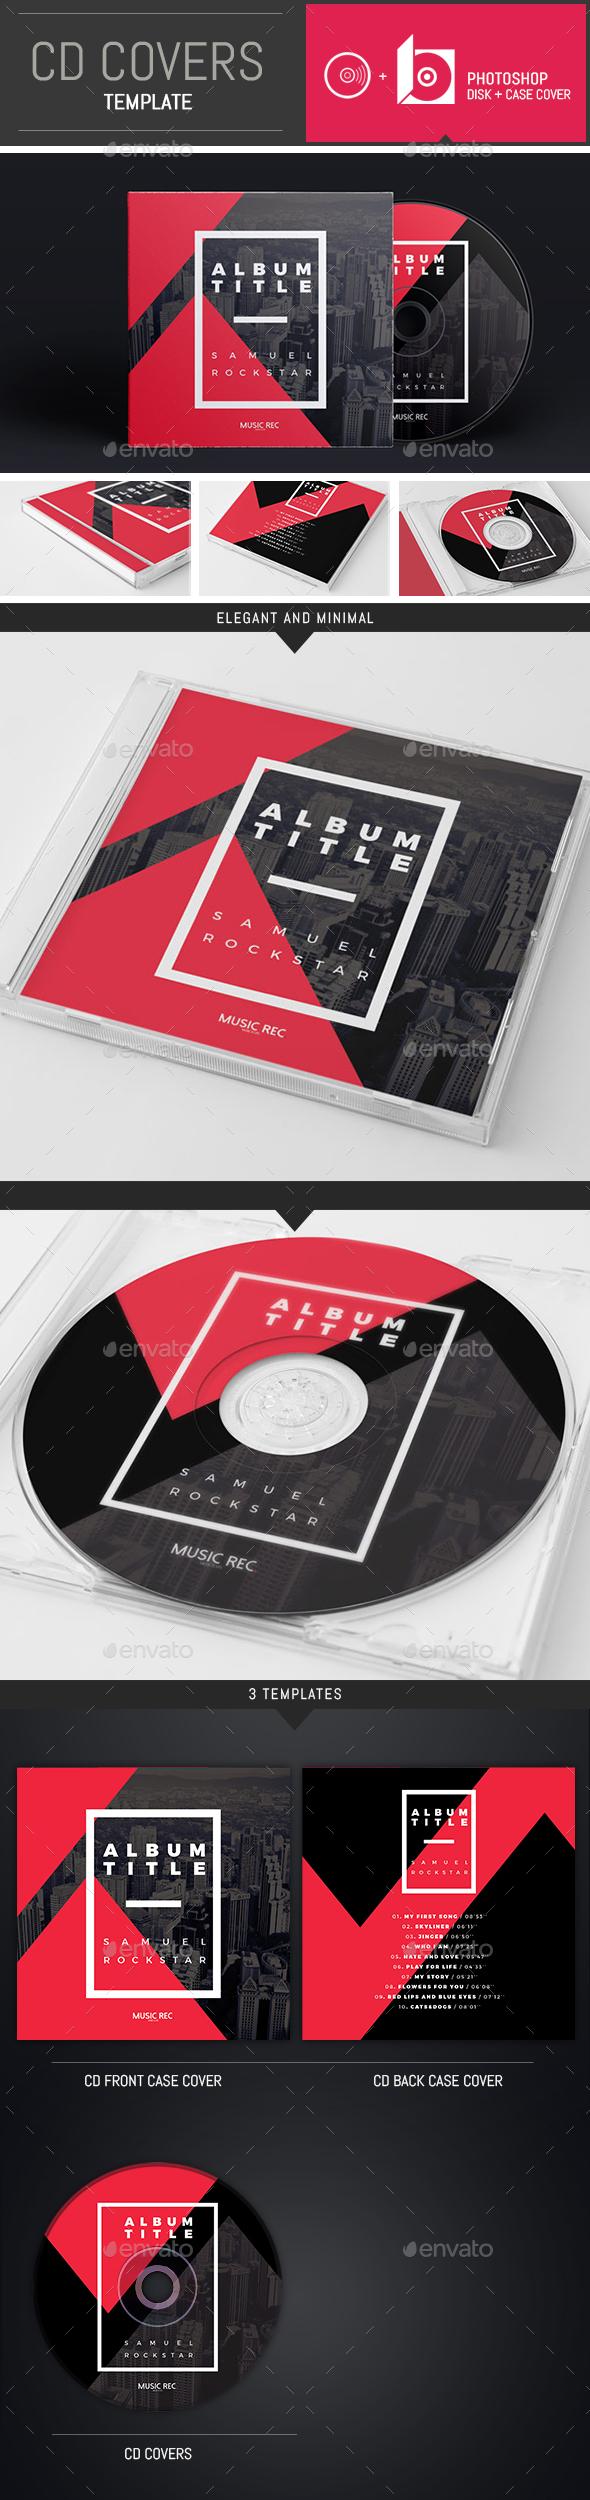 DJ / Musician Abstract CD Cover Template - CD & DVD Artwork Print Templates